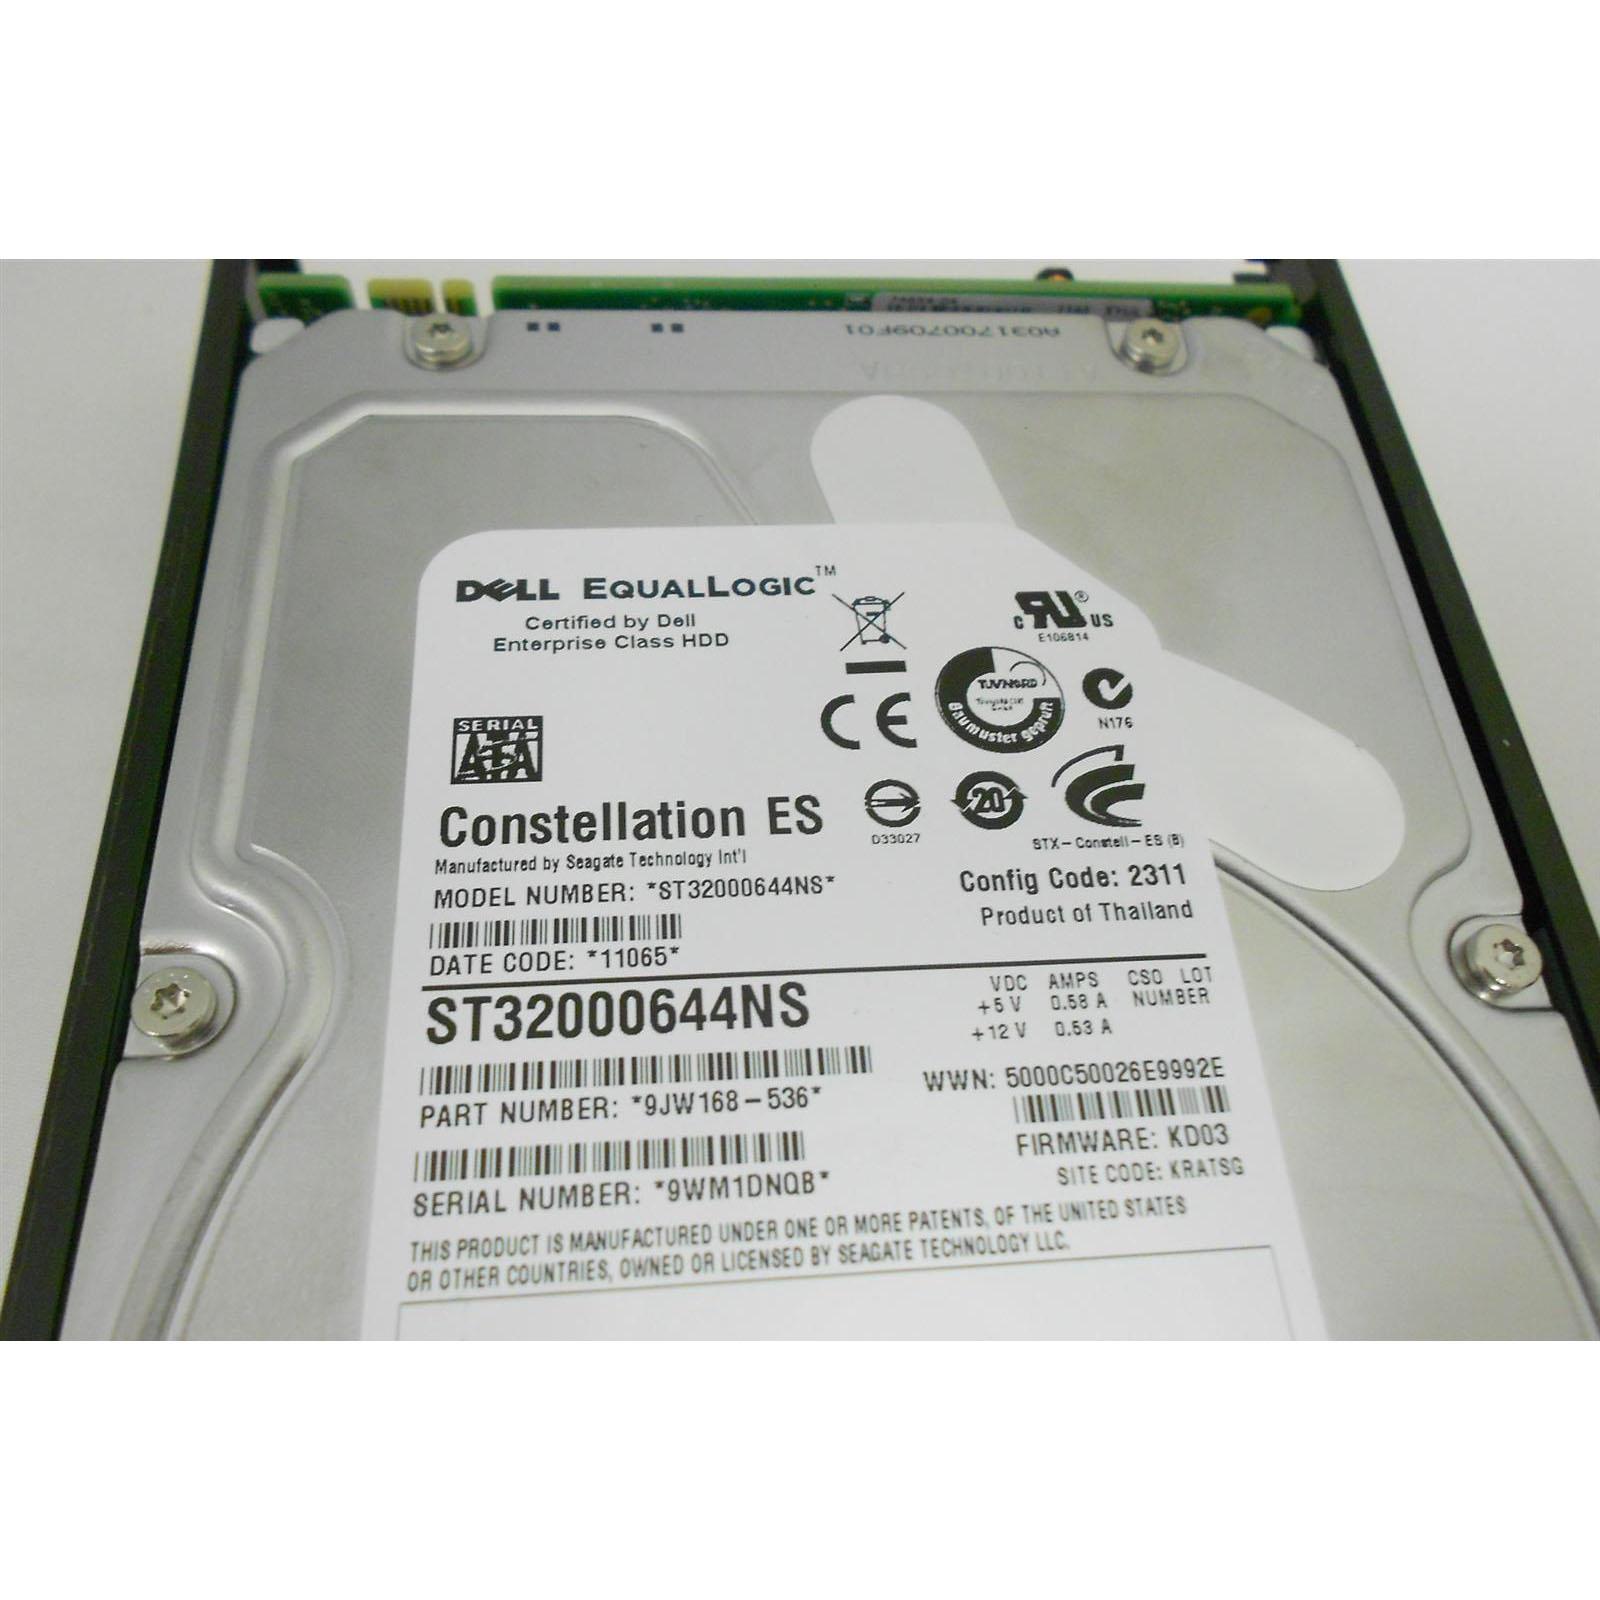 9jw168-536 Dell EqualLogic 2TB SATA HDD